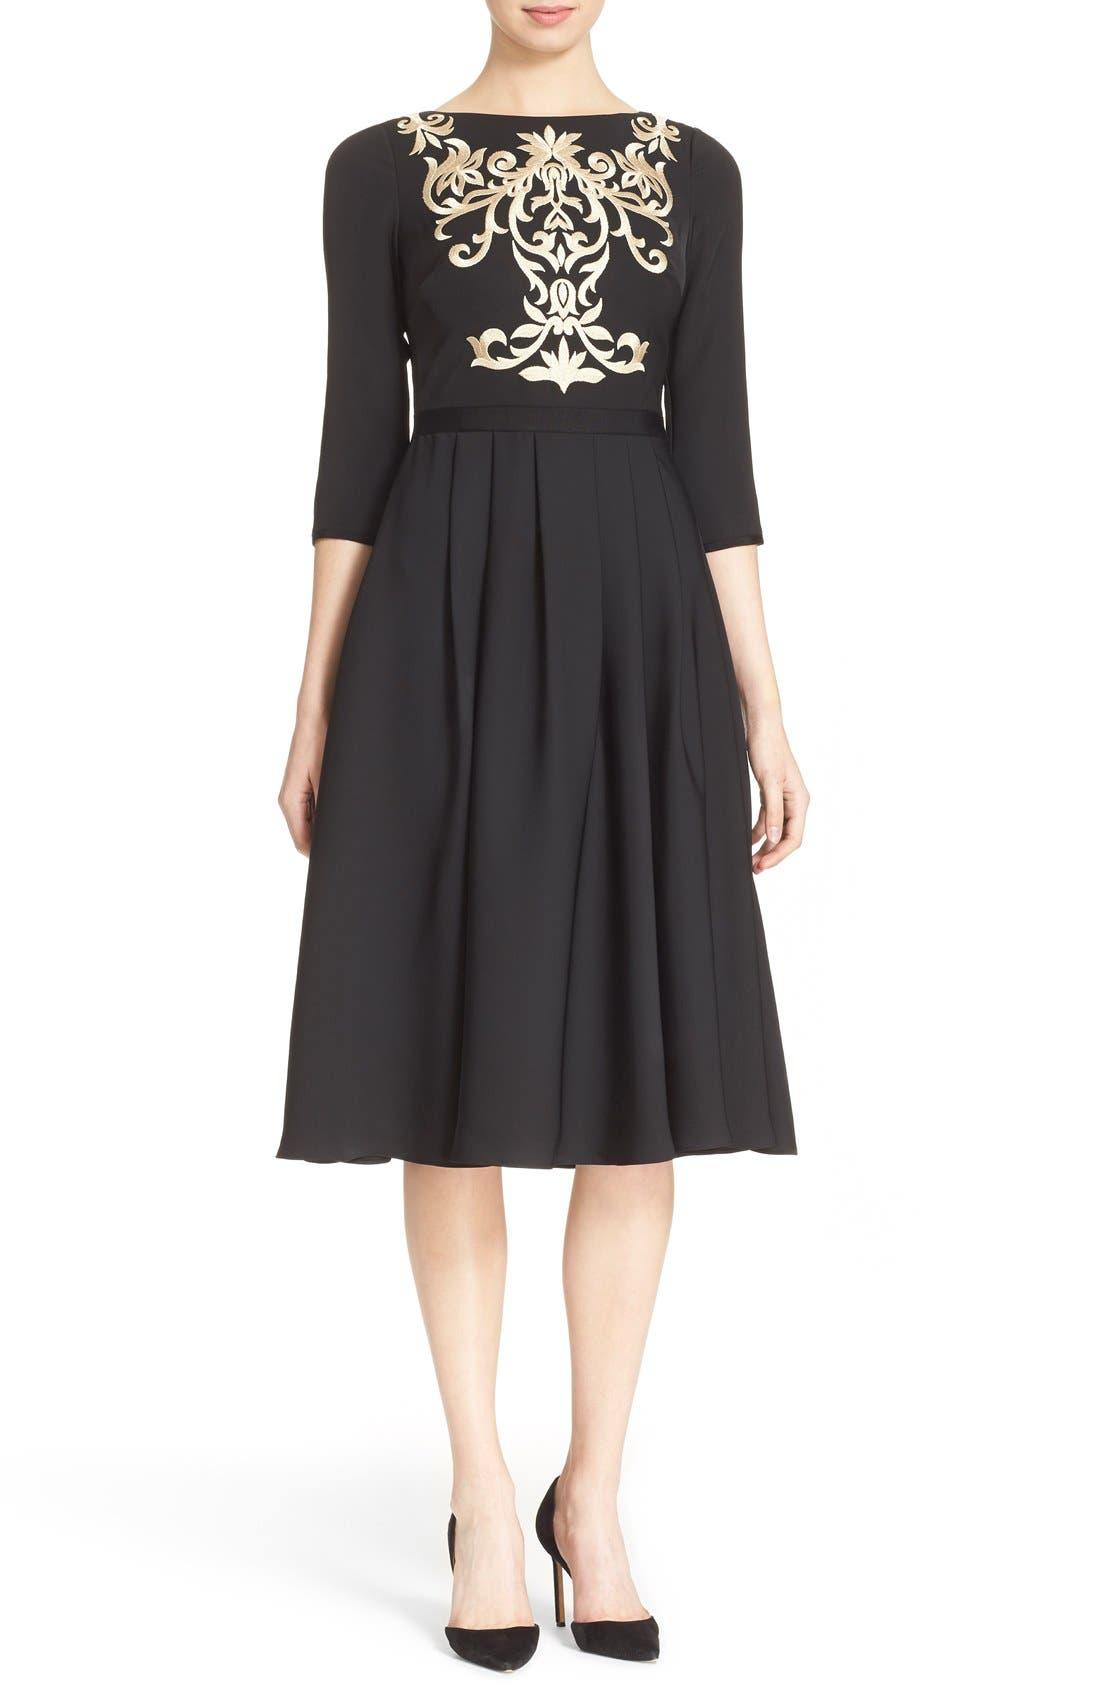 Alternate Image 1 Selected - Ted Baker London 'Shamari' Embroidered Bodice Midi Dress